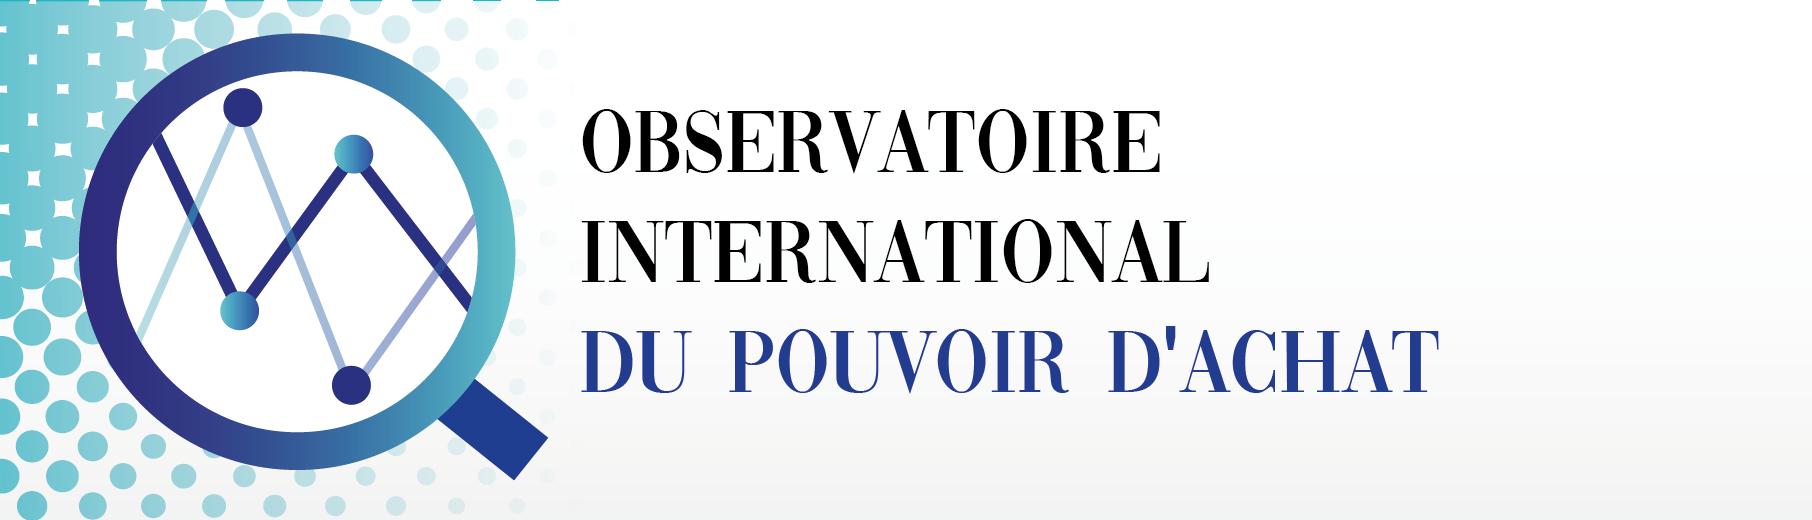 Header Observatoire International du Pouvoir D'Achat